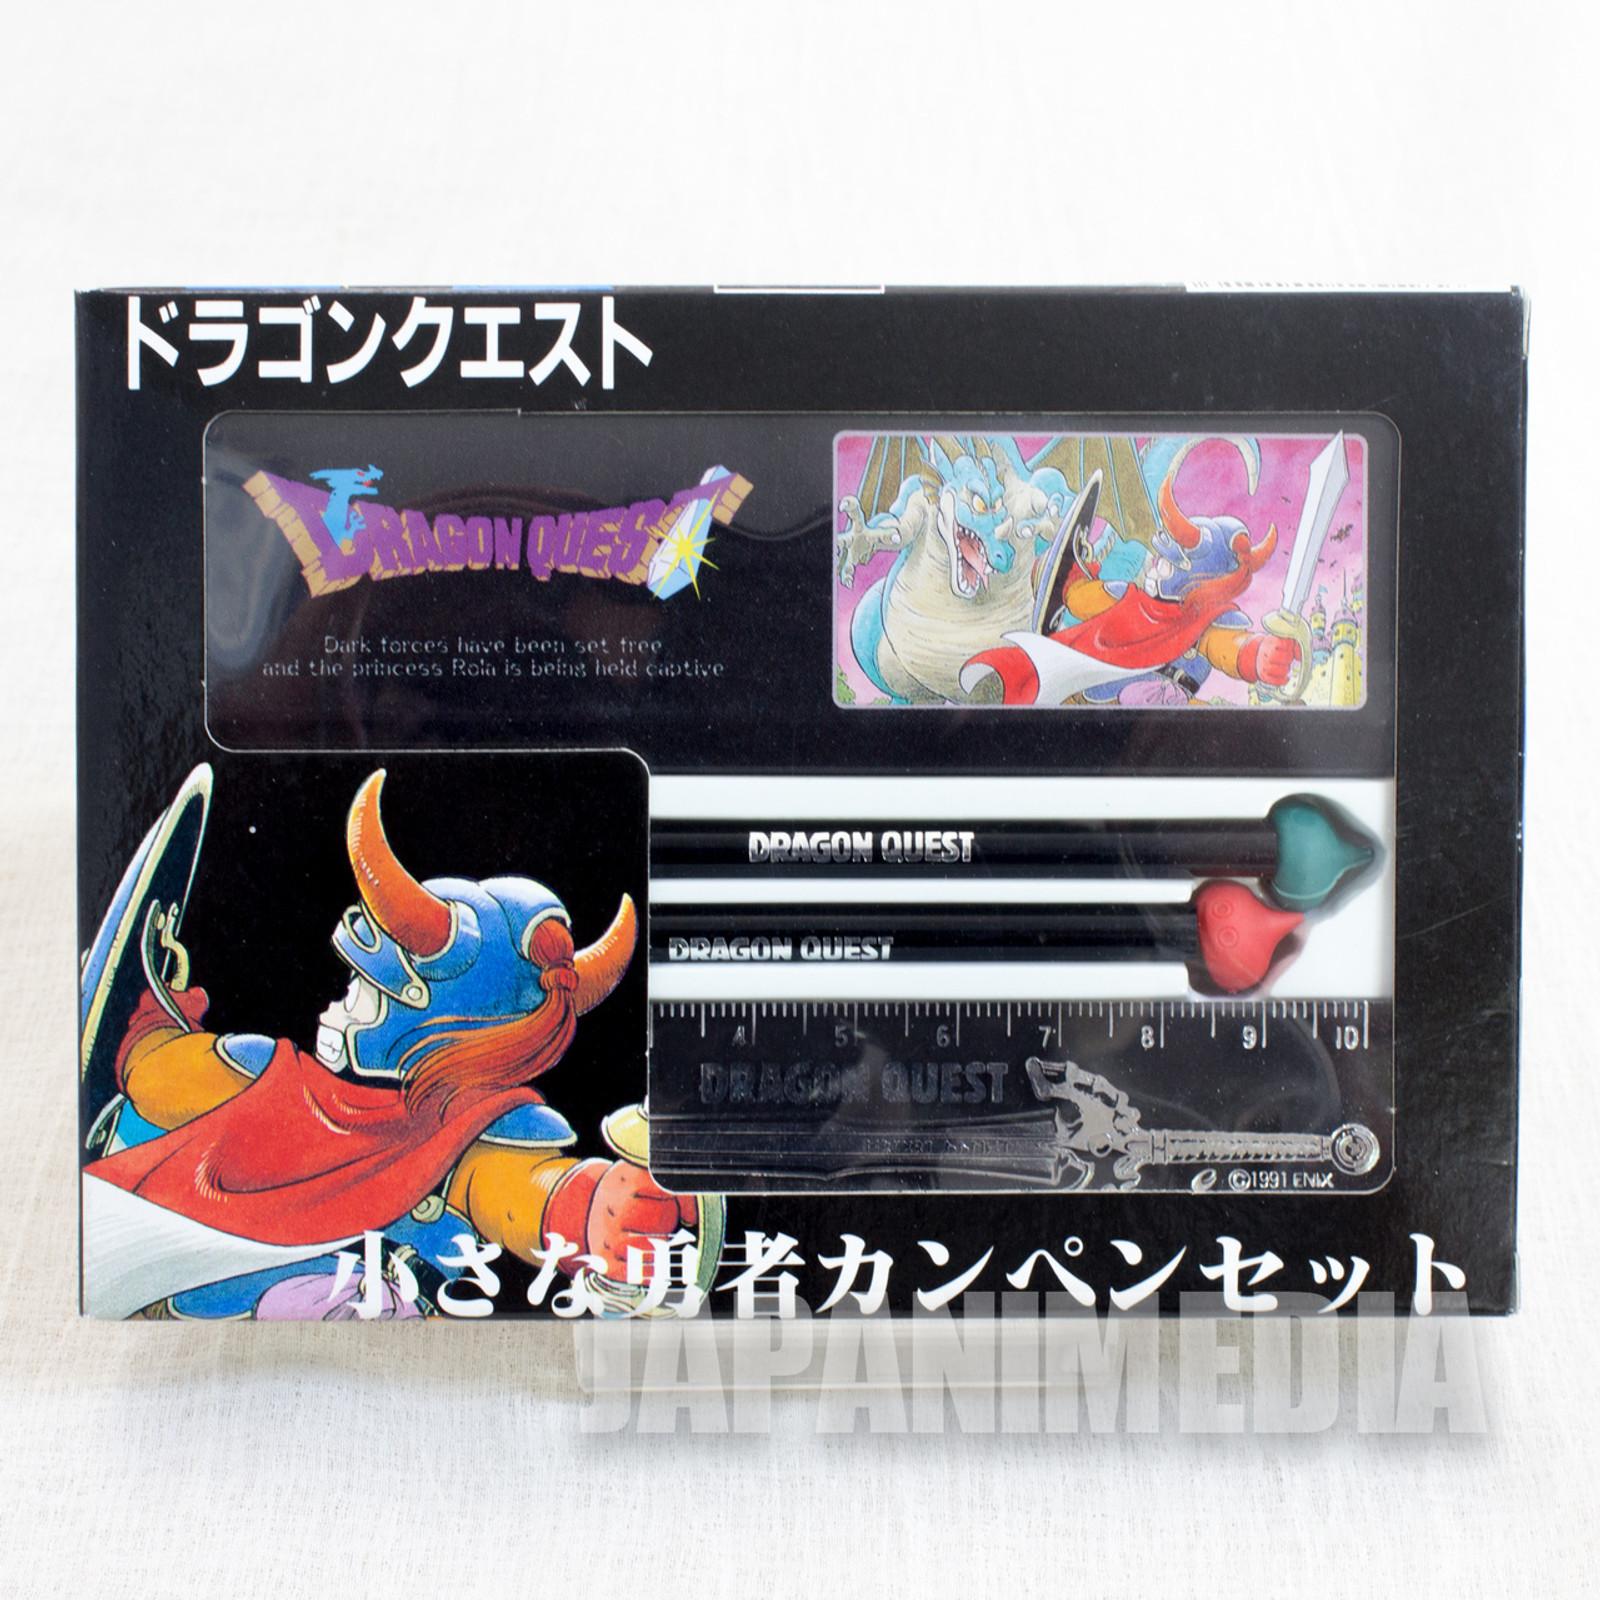 Retro RARE Dragon Quest Mini Stationery set Enix 1991 [Pen Case / Pencil / Ruler ] JAPAN GAME NES